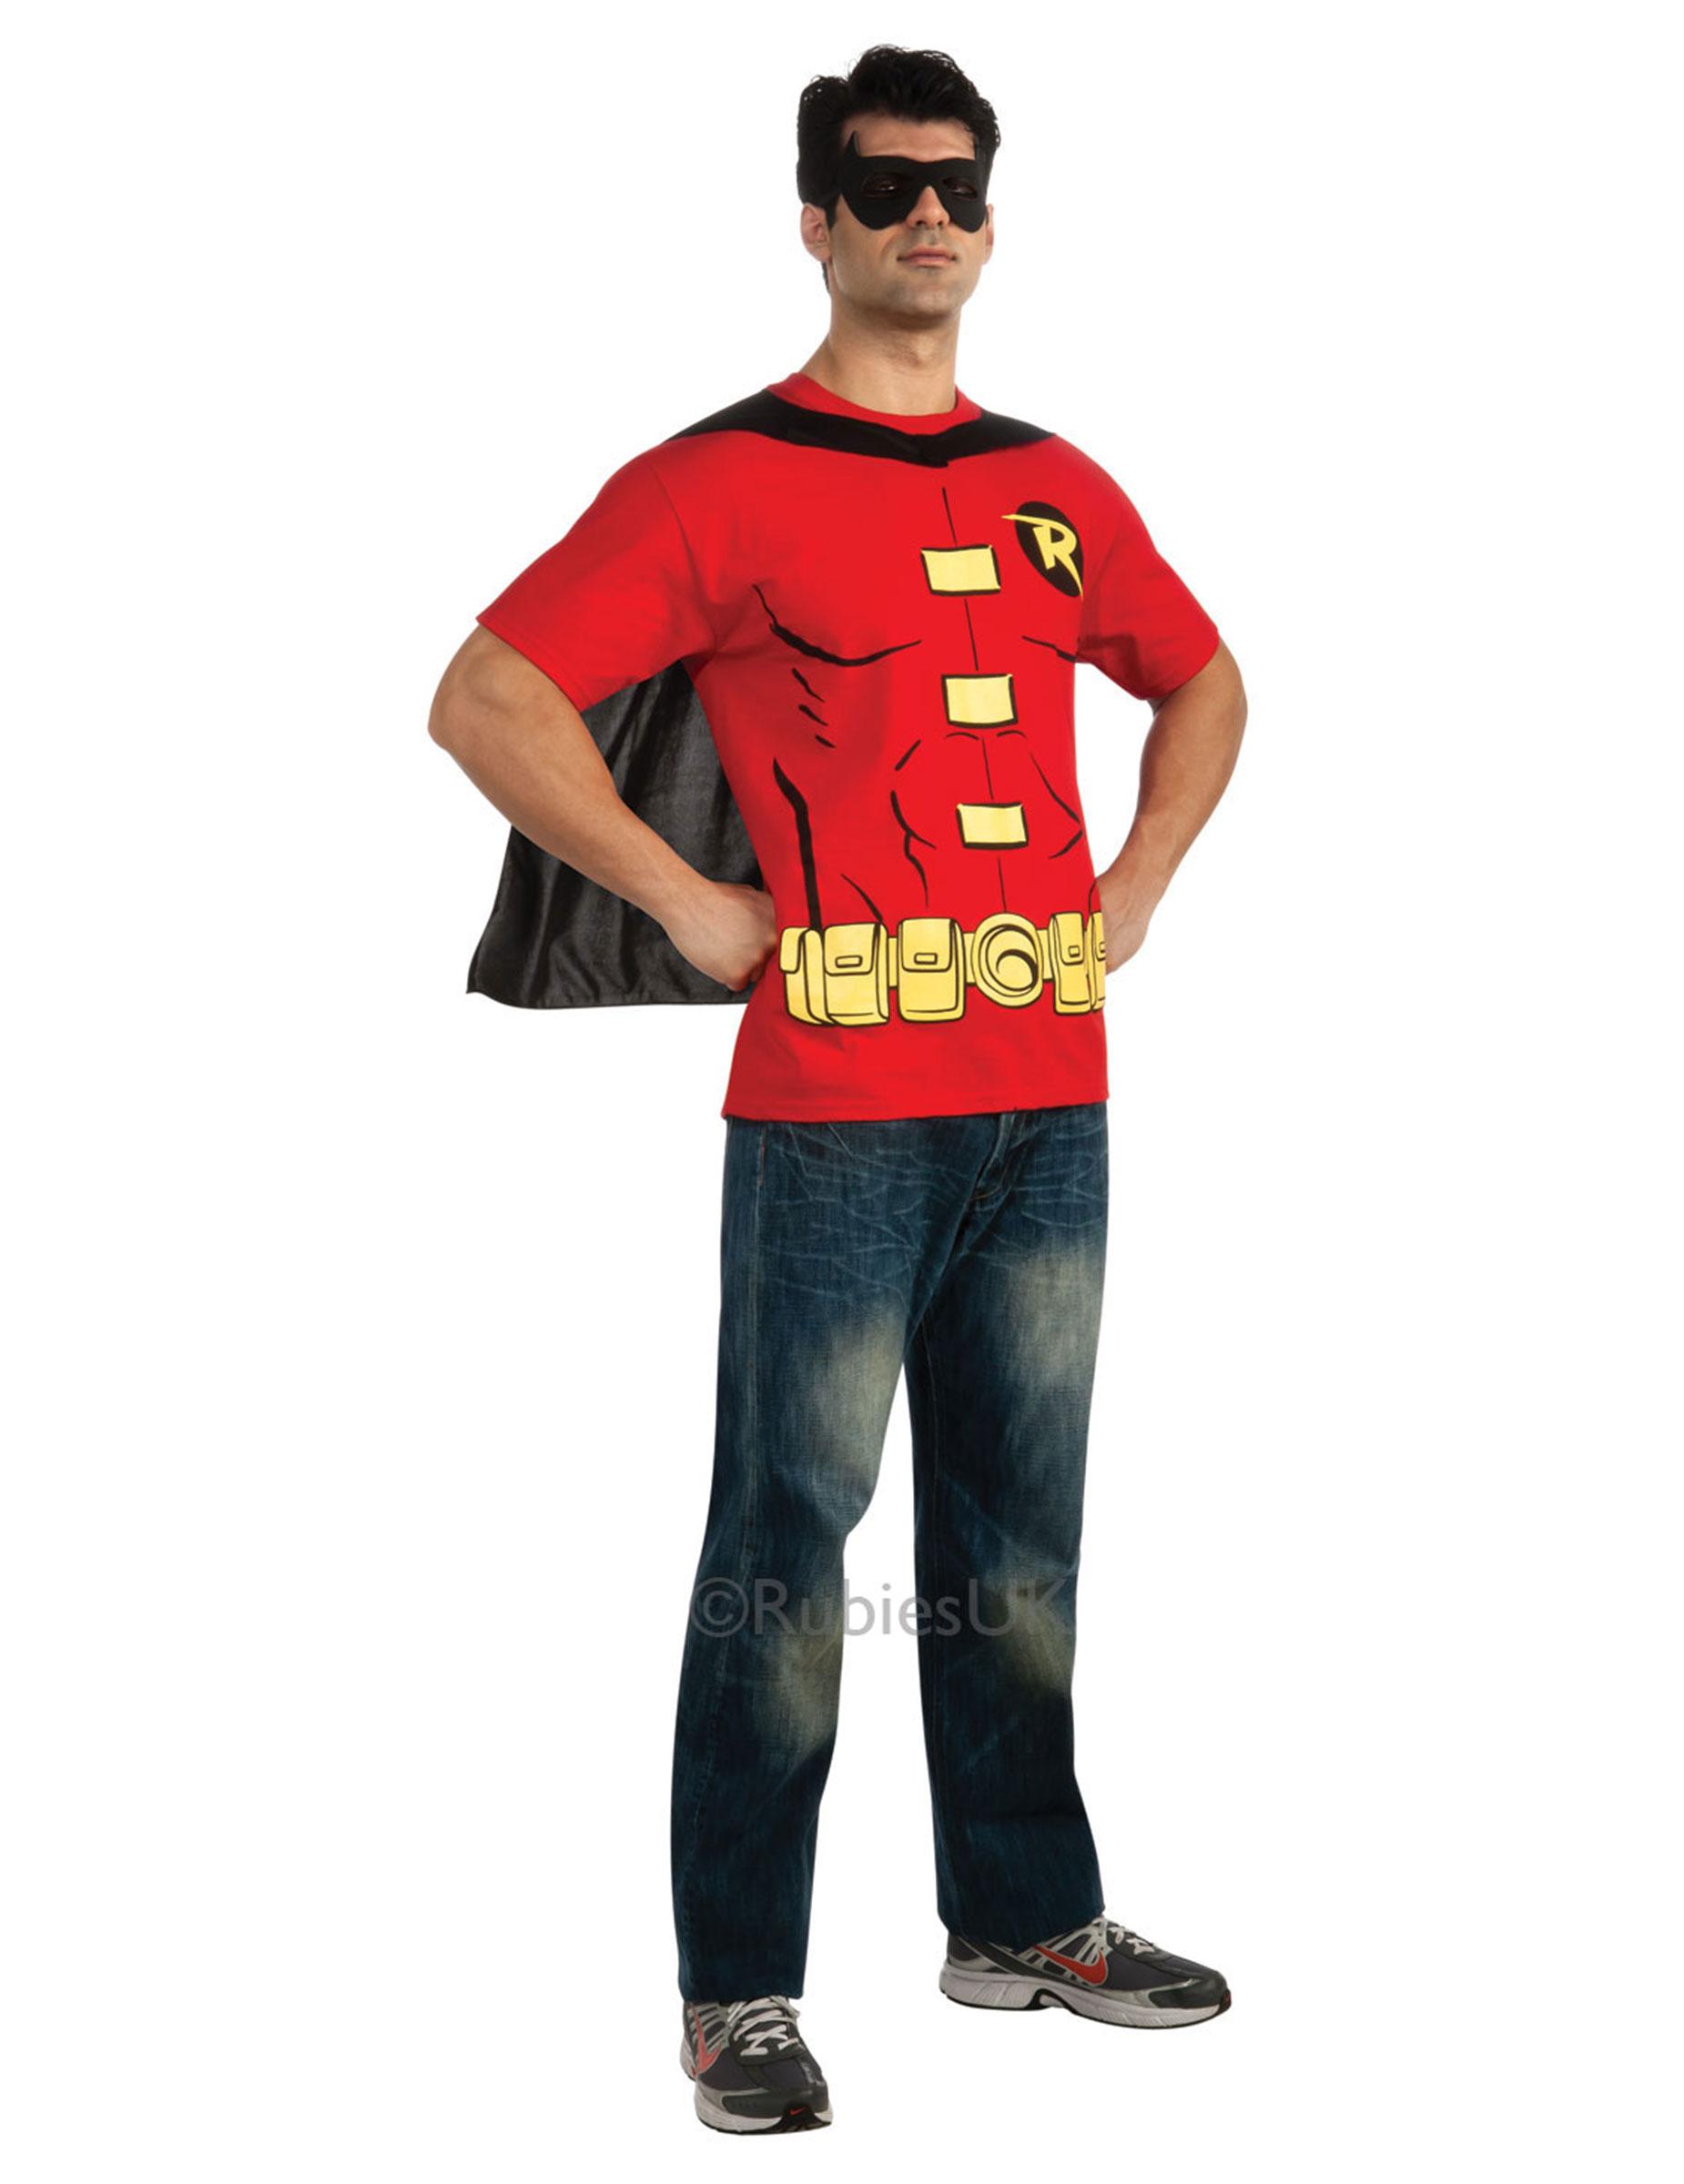 T-shirt e maschera di Robin™ per adulto su VegaooParty 9dc9ec2ede7